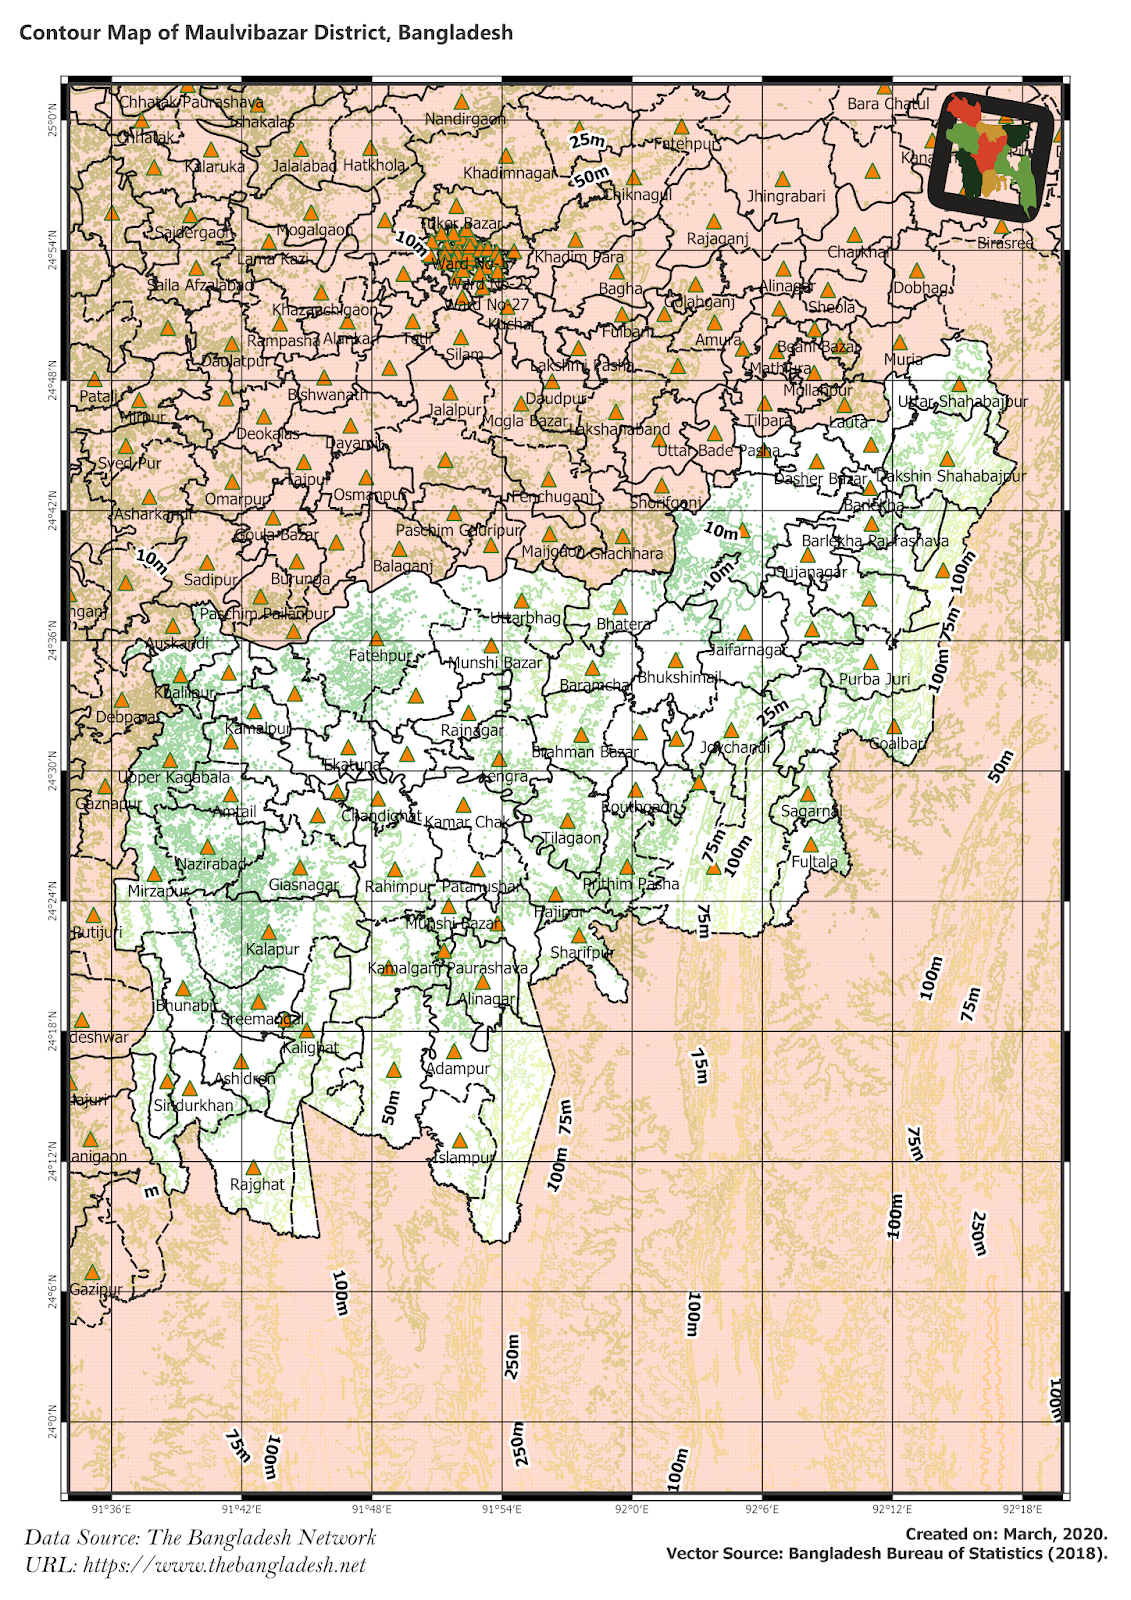 Elevation Map of Moulvibazar District of Bangladesh